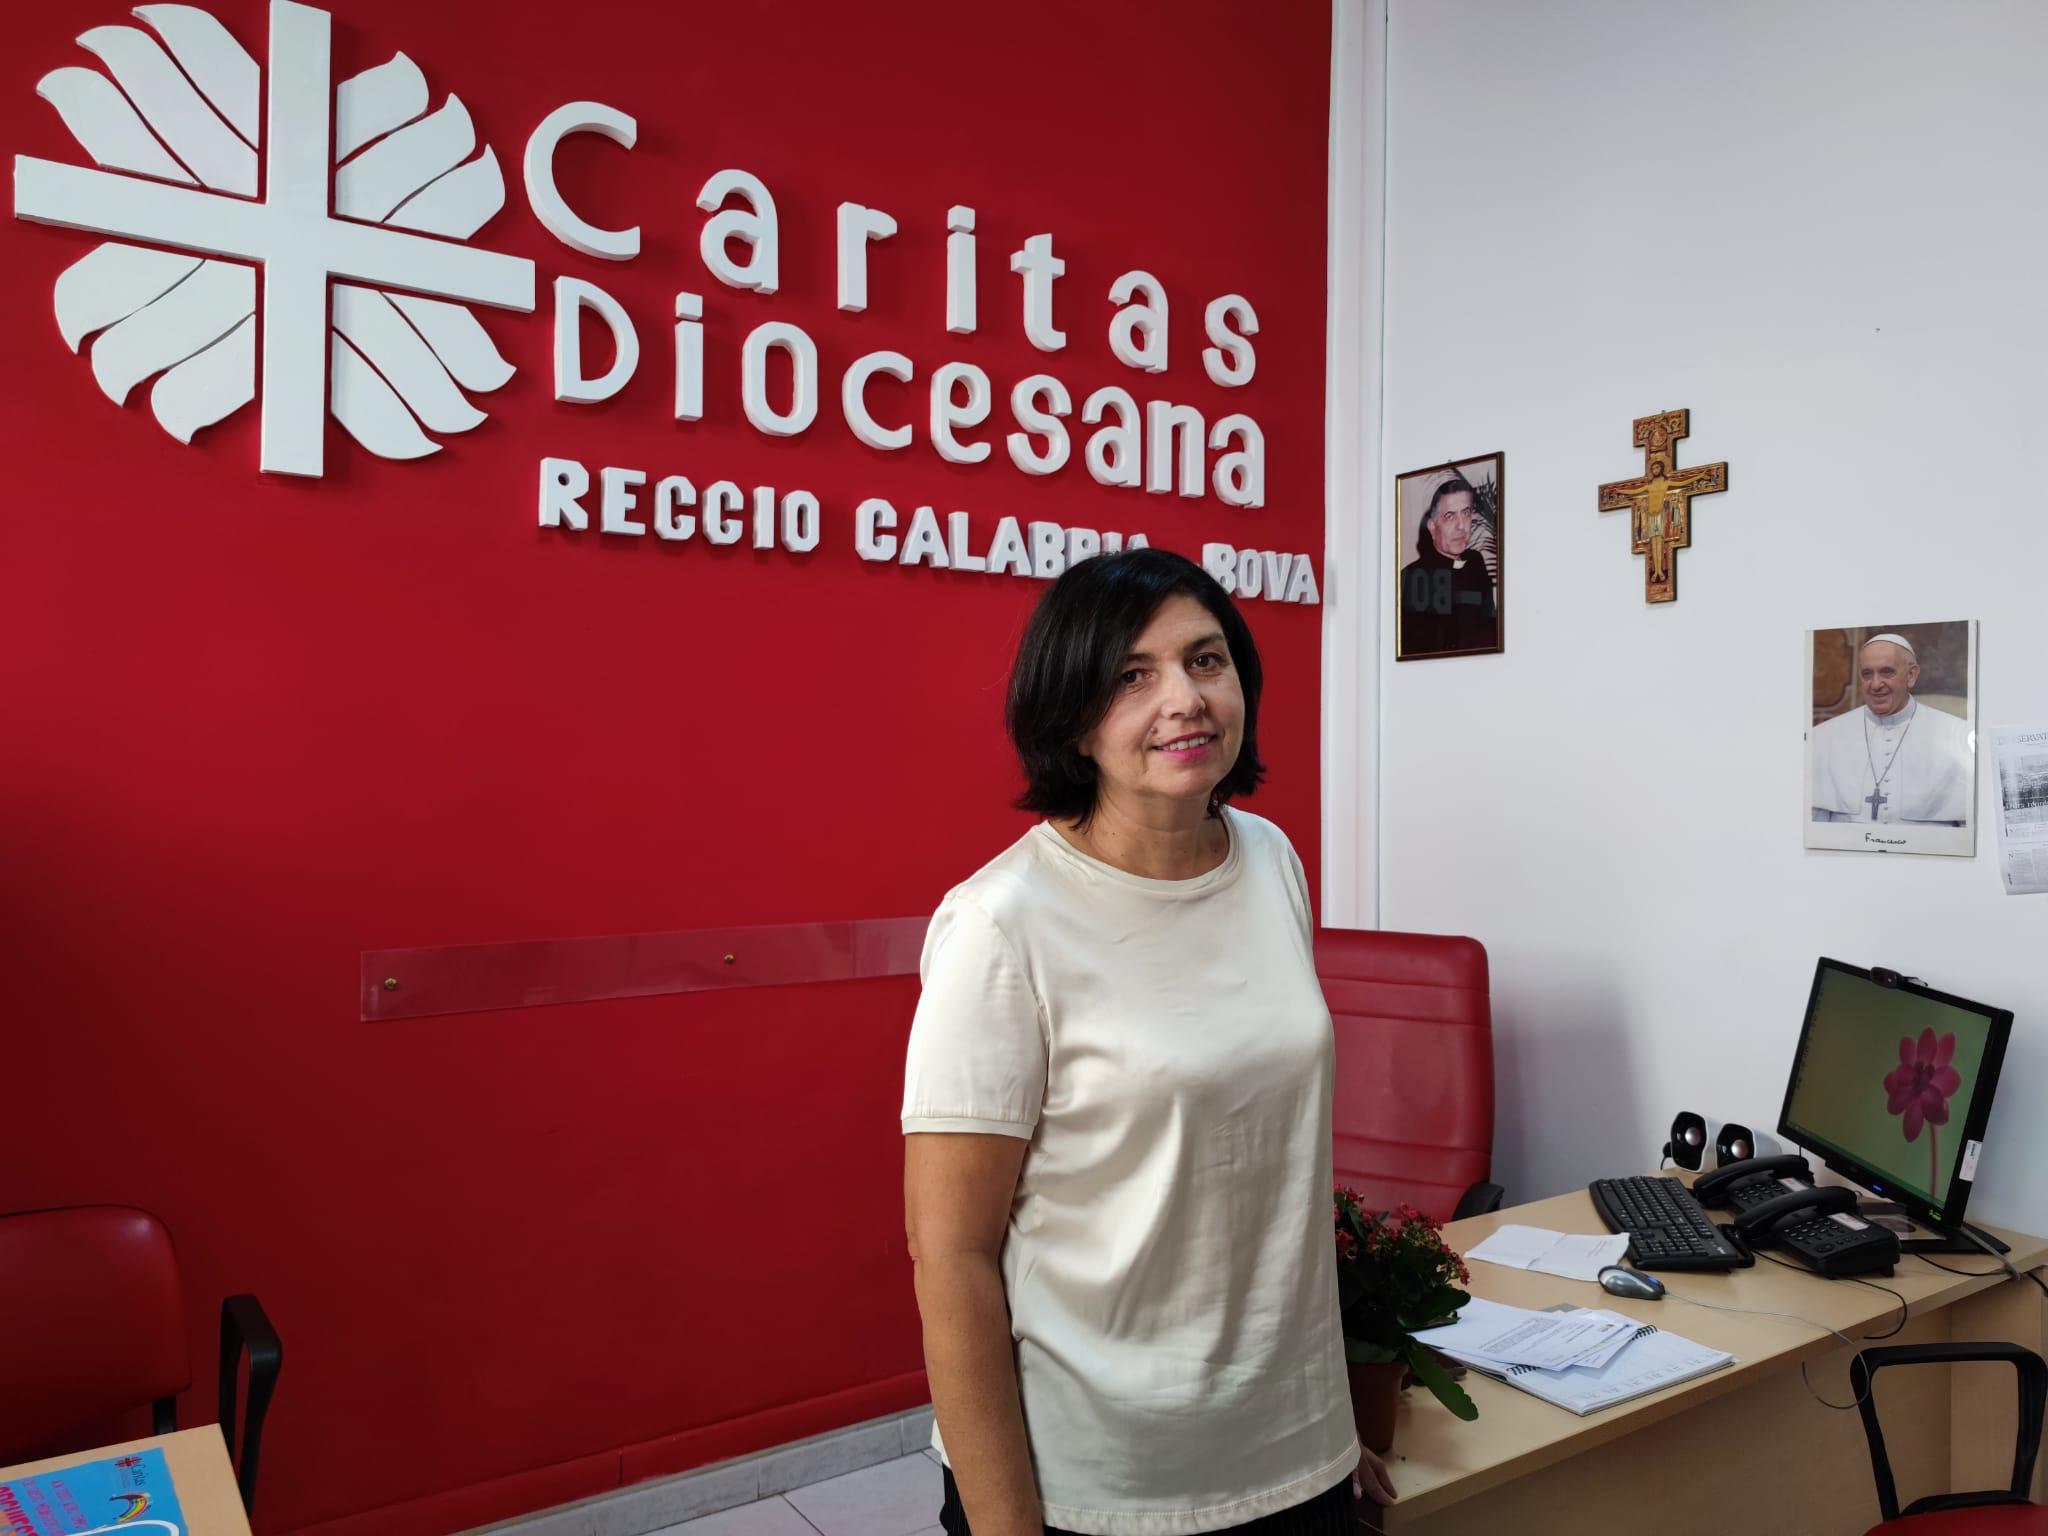 Mariangela Ambrogio Caritas